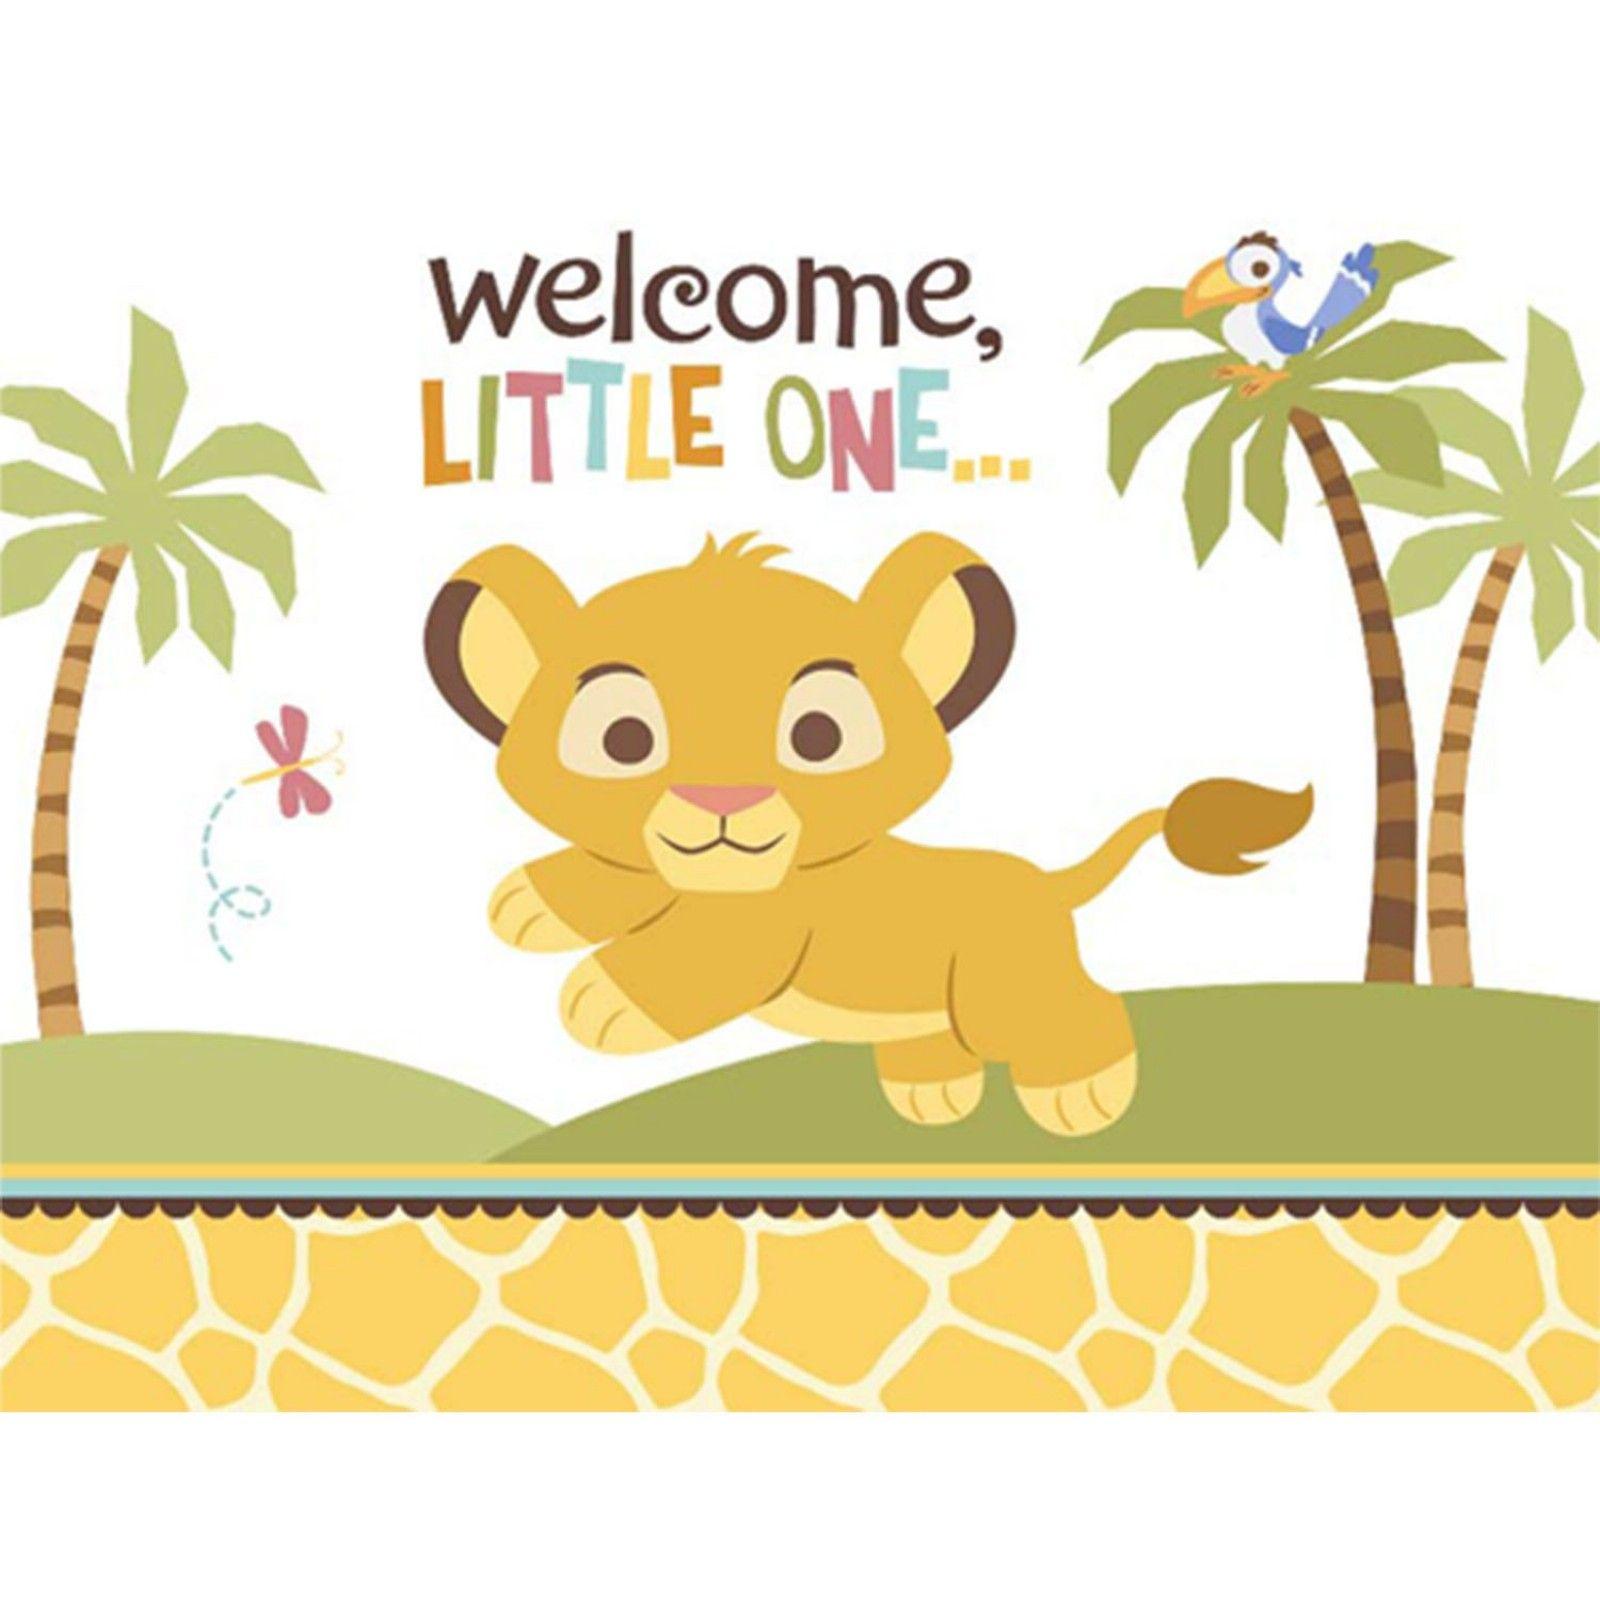 Delightful Simba Baby Shower Invite, Go To Www.likegossip.com To Get More Gossip